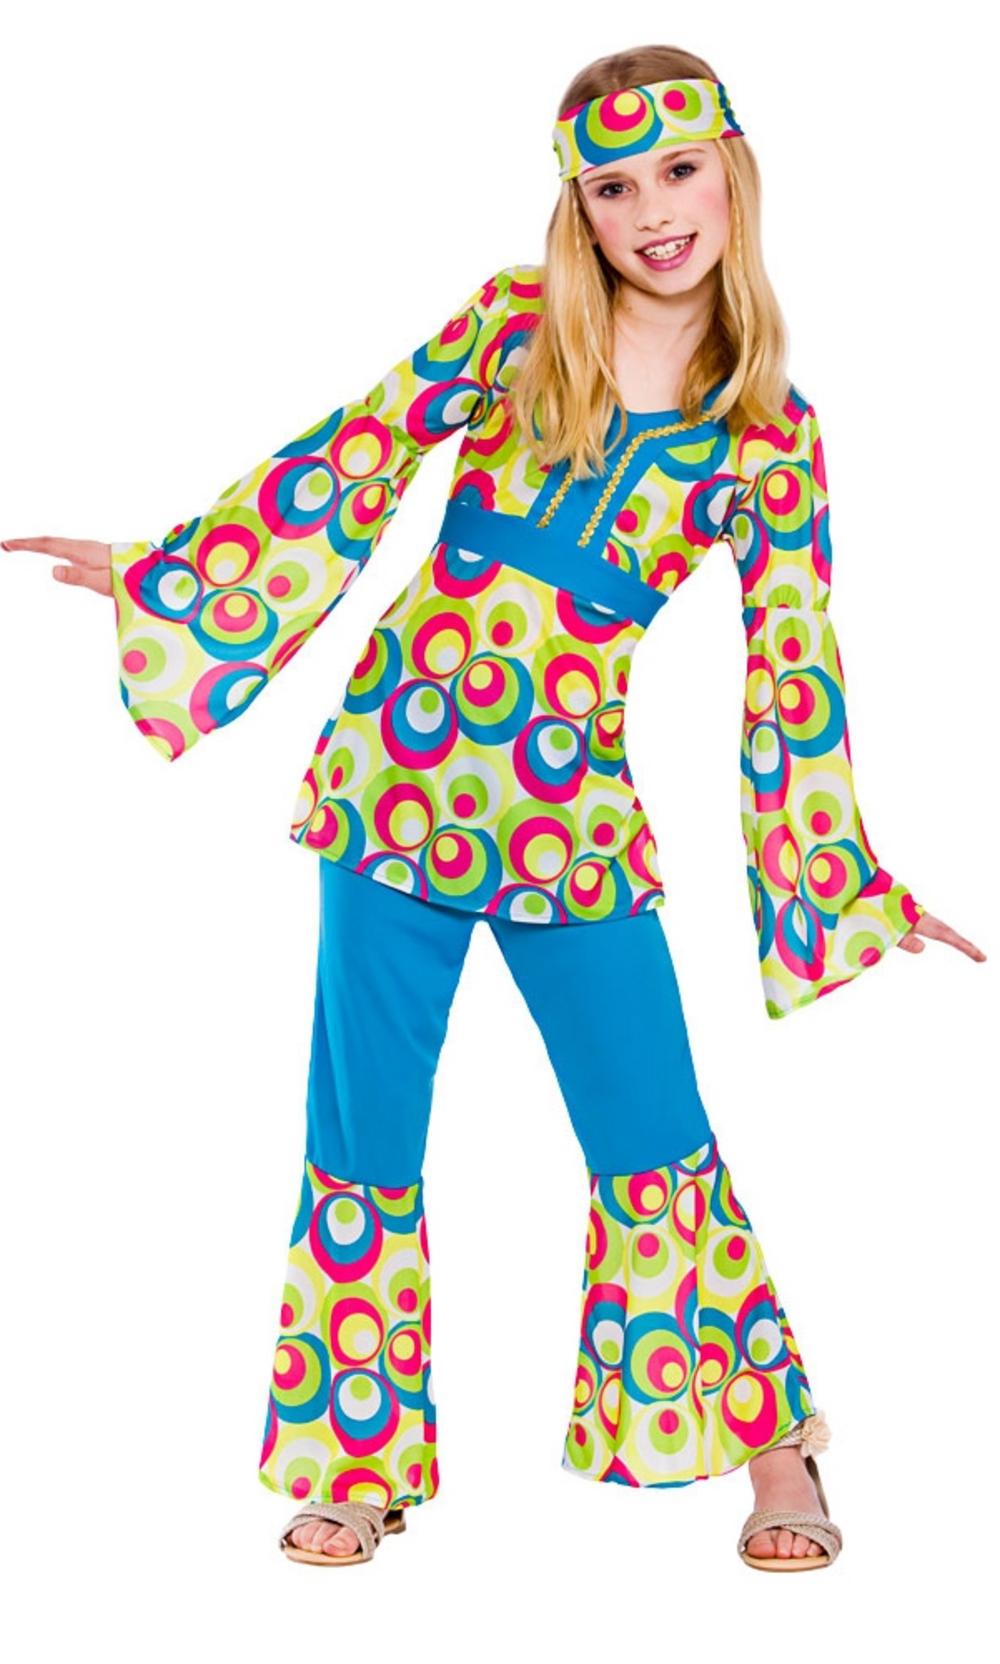 How to Dress Like a Hippie forecasting